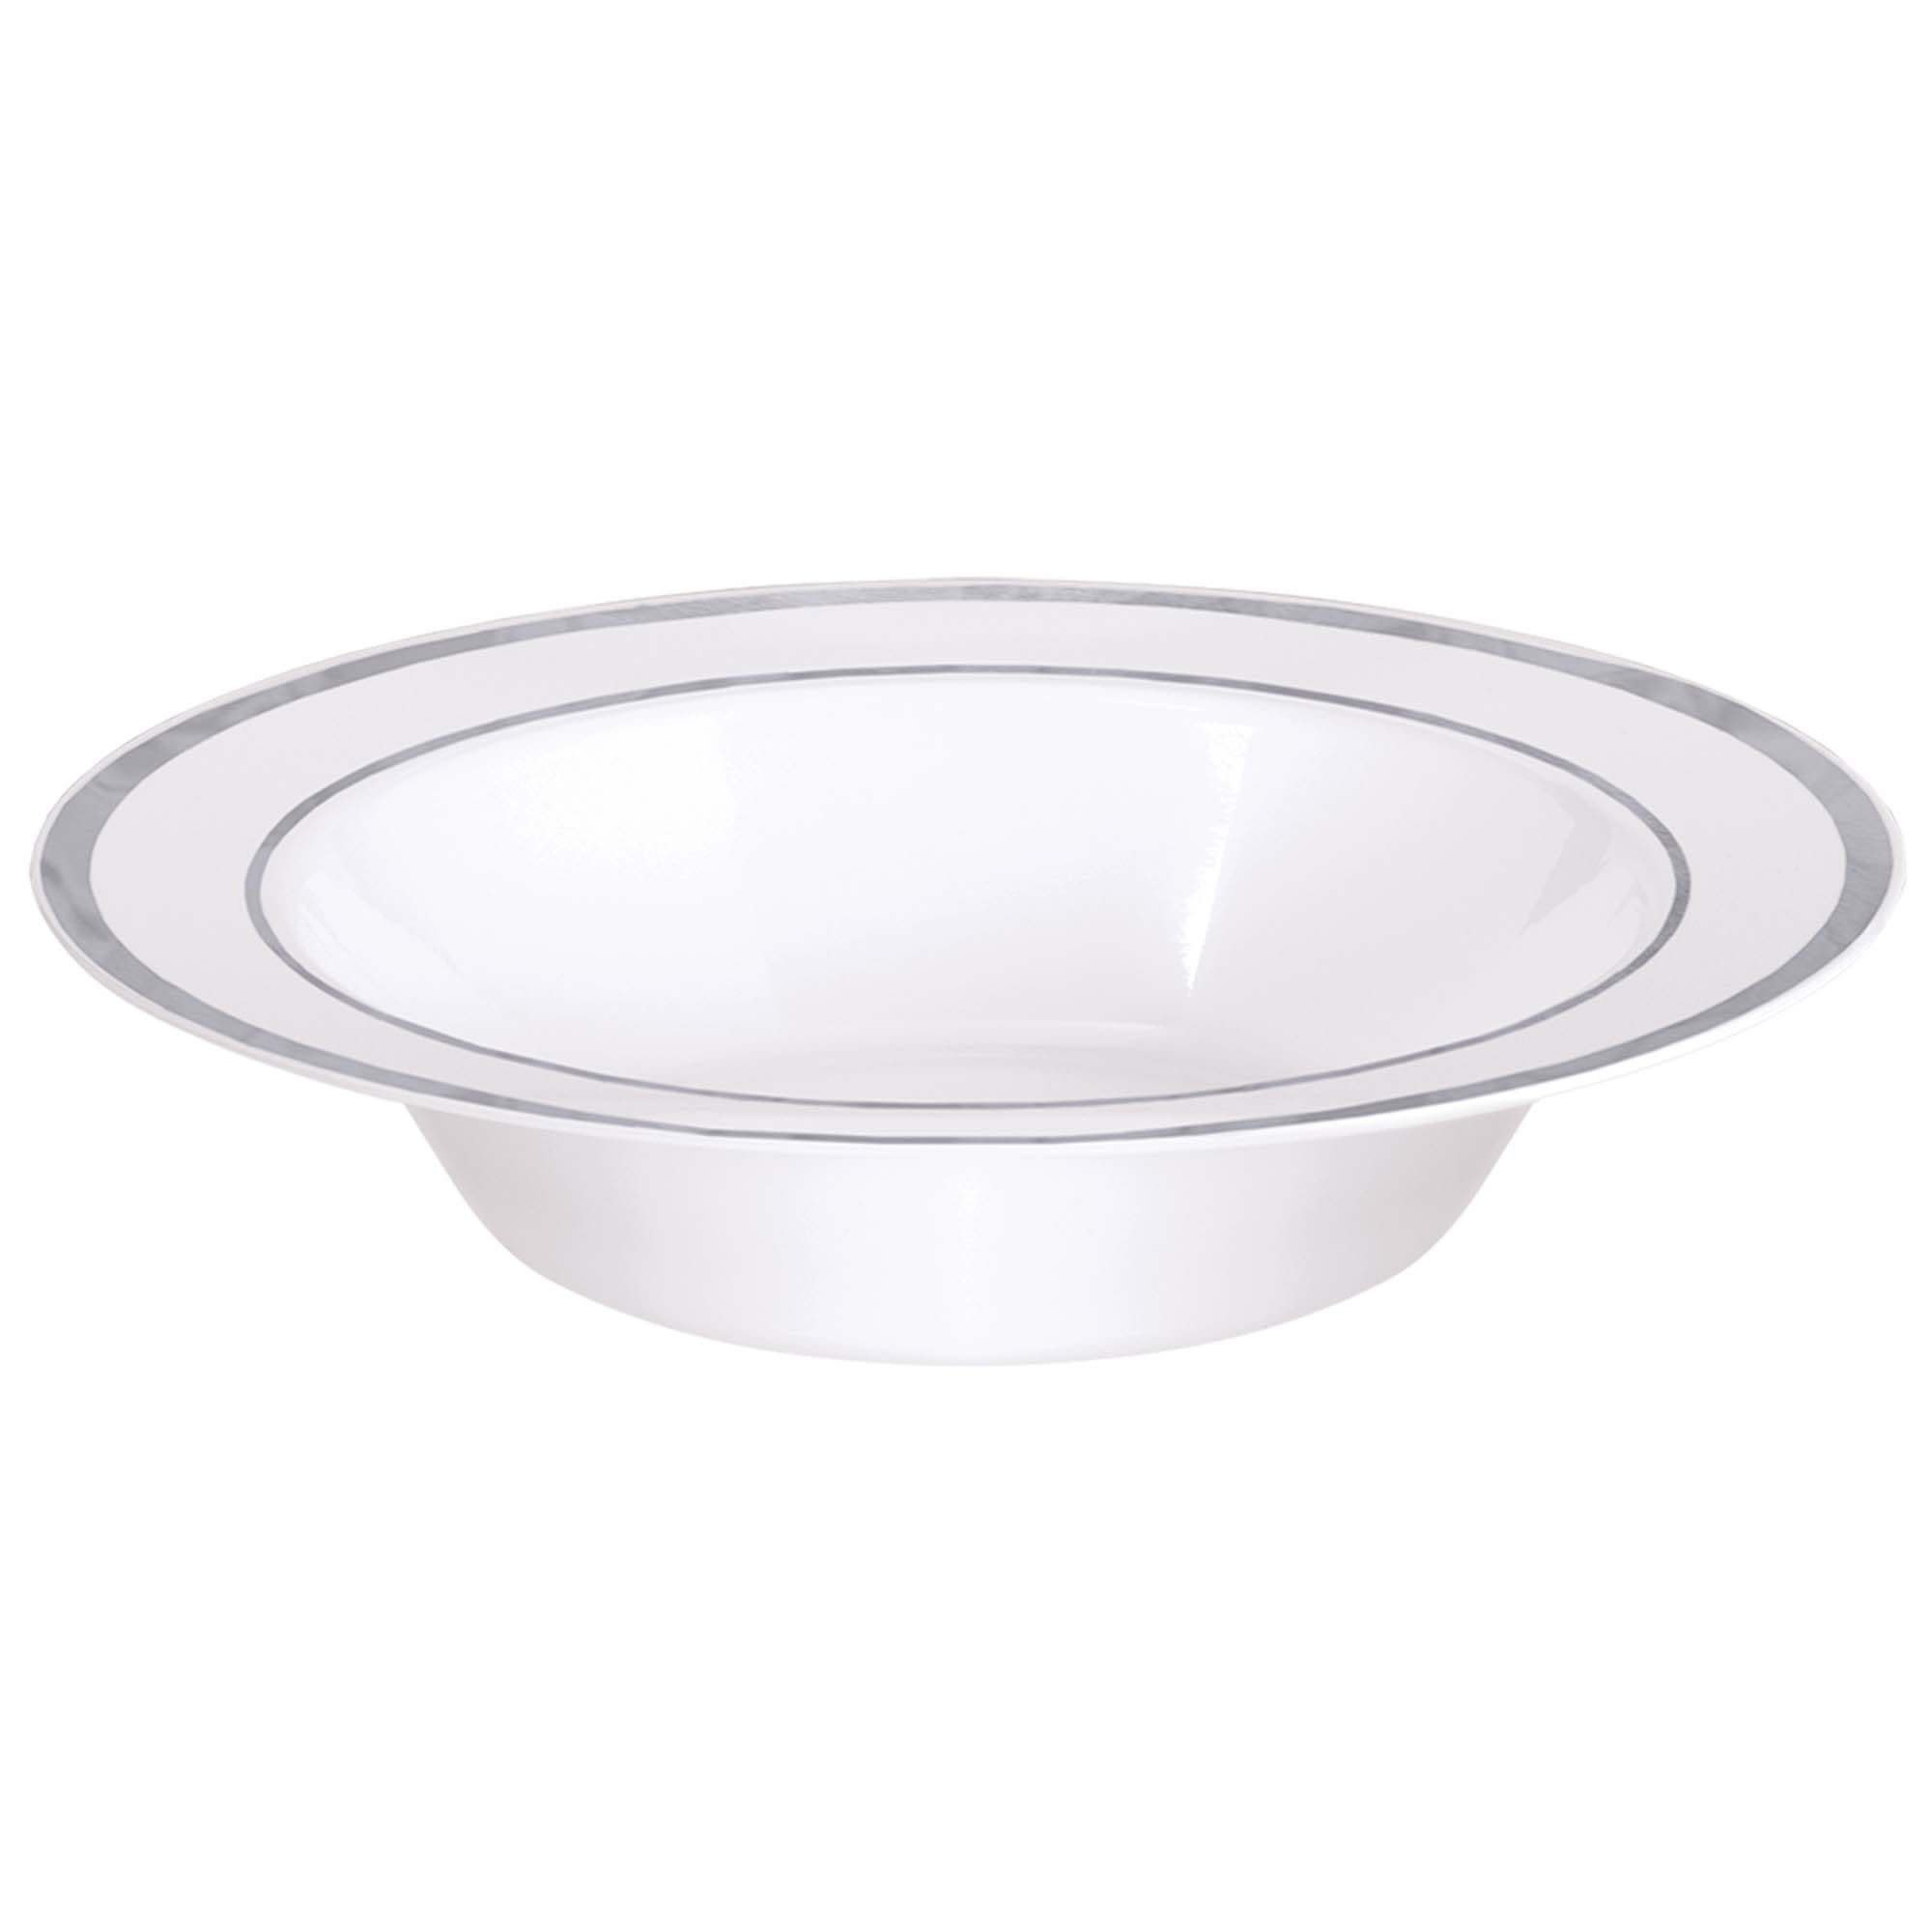 White Premium Plastic Bowls With Silver Trim, 12 Oz.